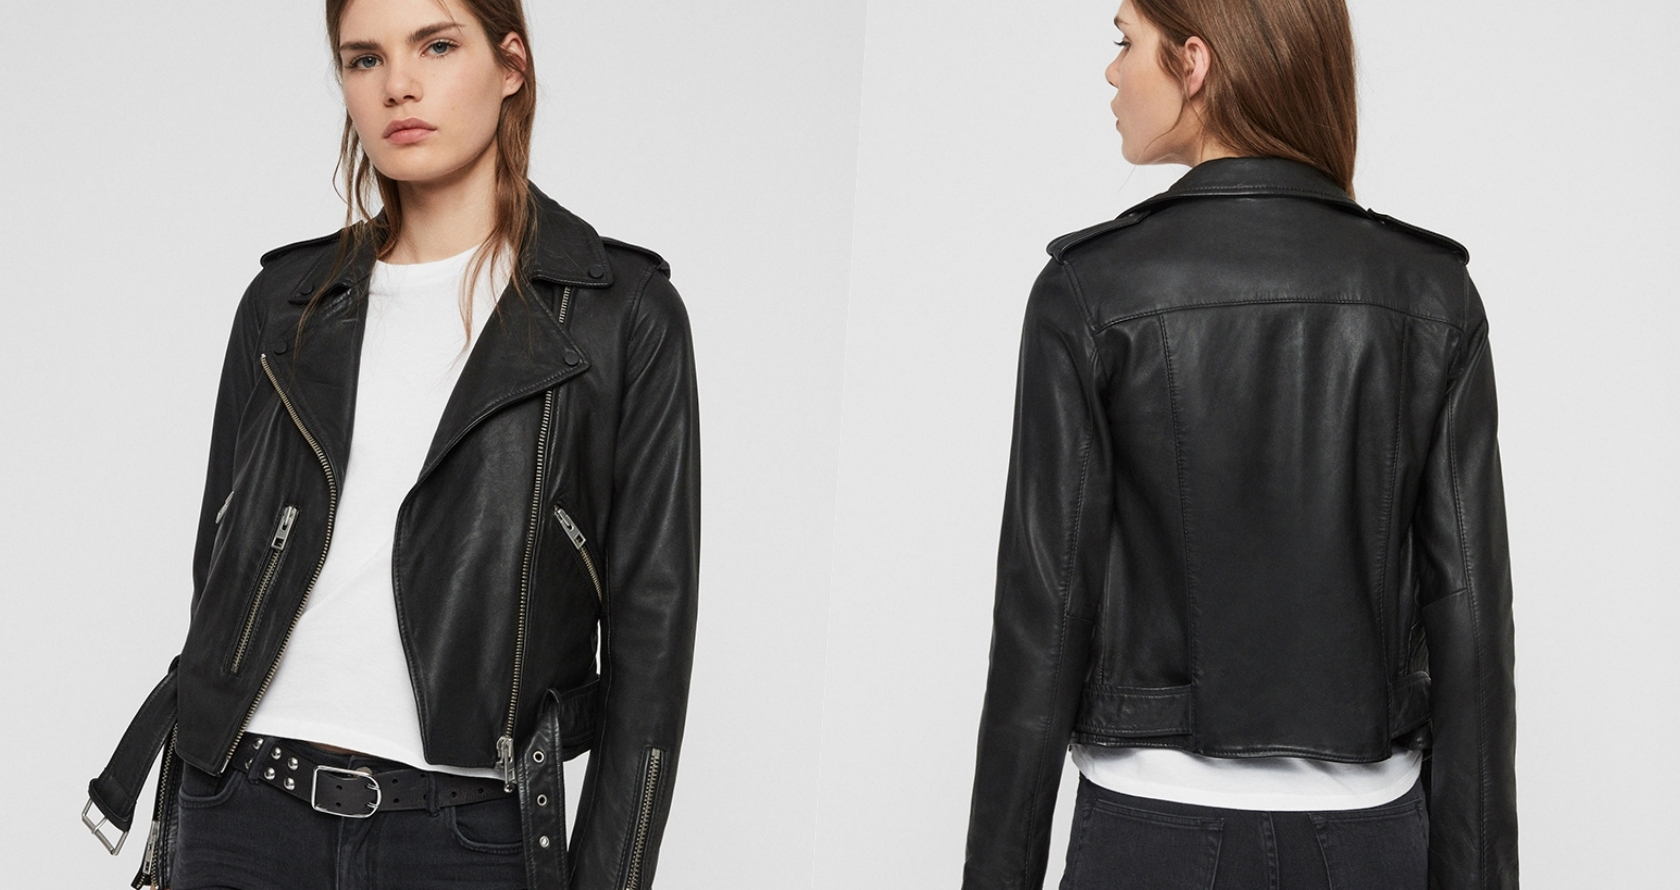 All Saints最熱賣、最經典的皮衣款式之一,BALFERN BIKER將經典的騎士夾克